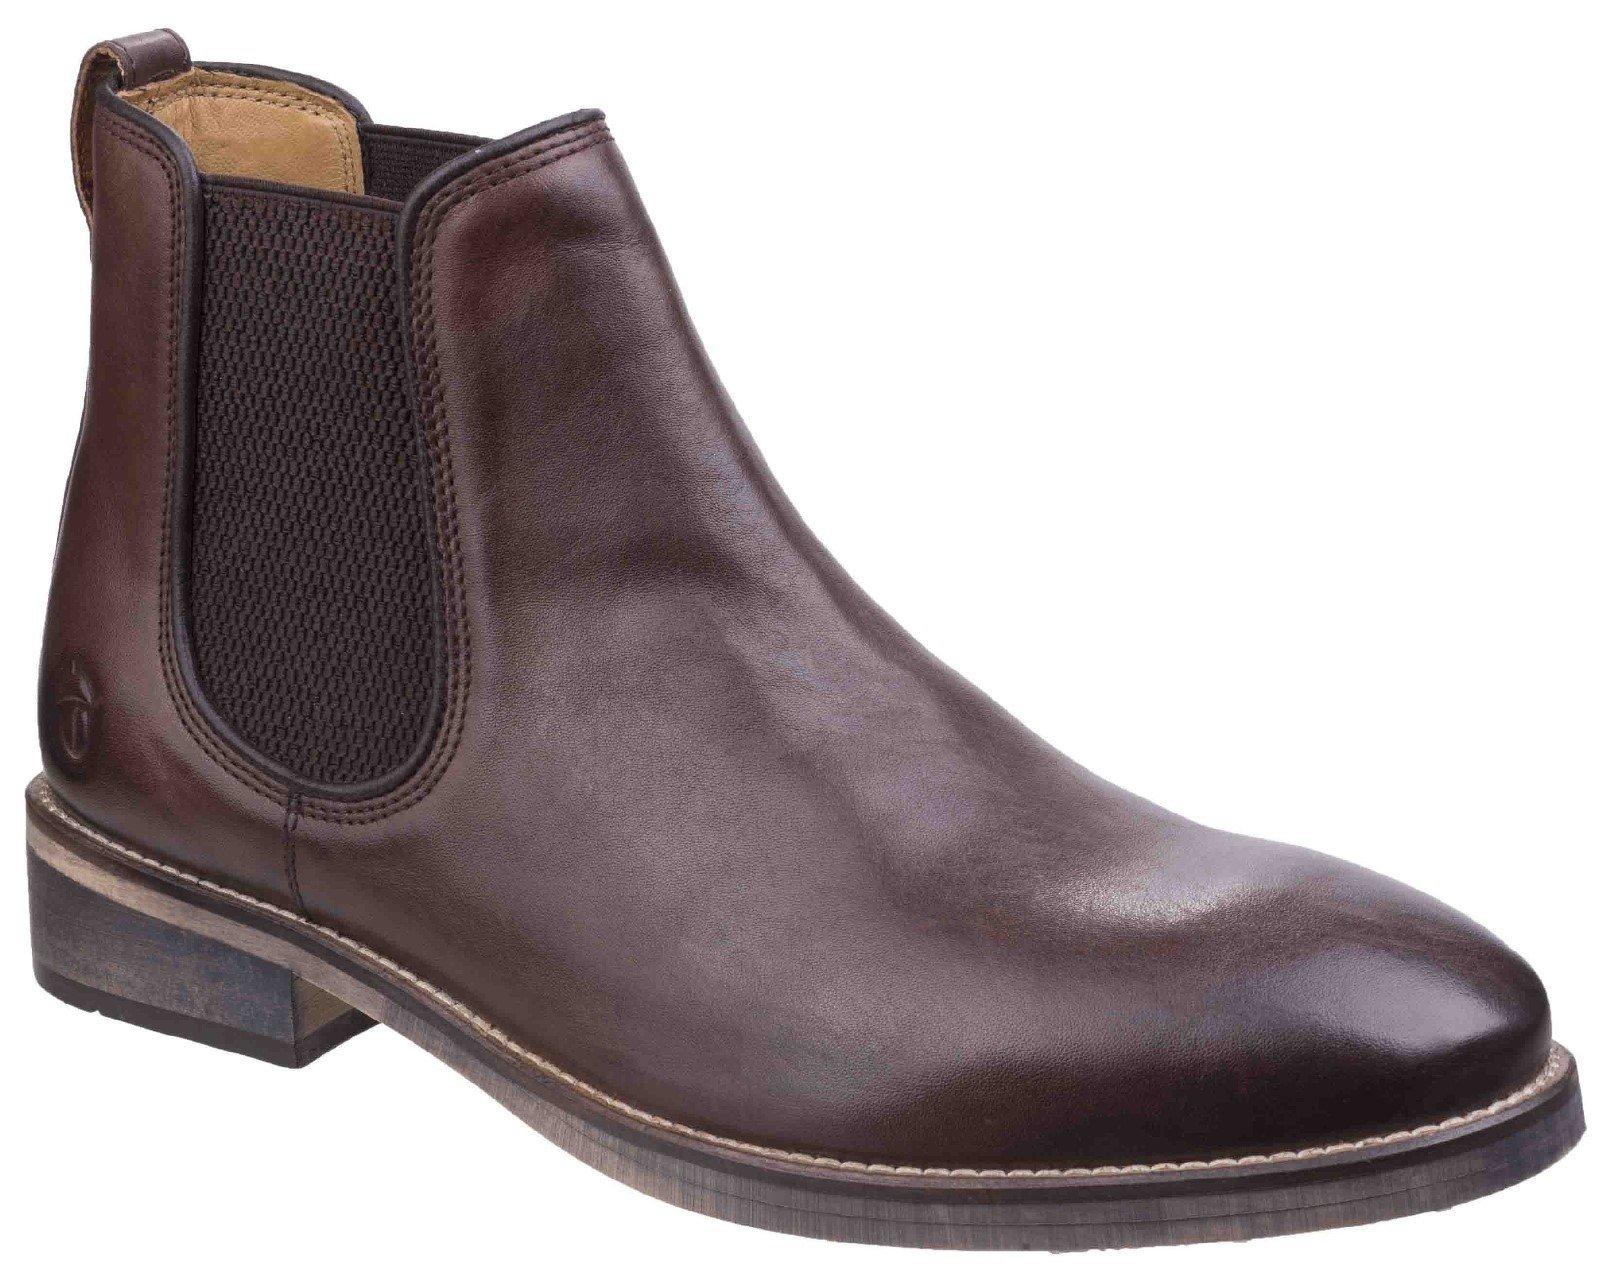 Cotswold Men's Corsham Chelsea Boot Various Colours 26268 - Dark Brown 6